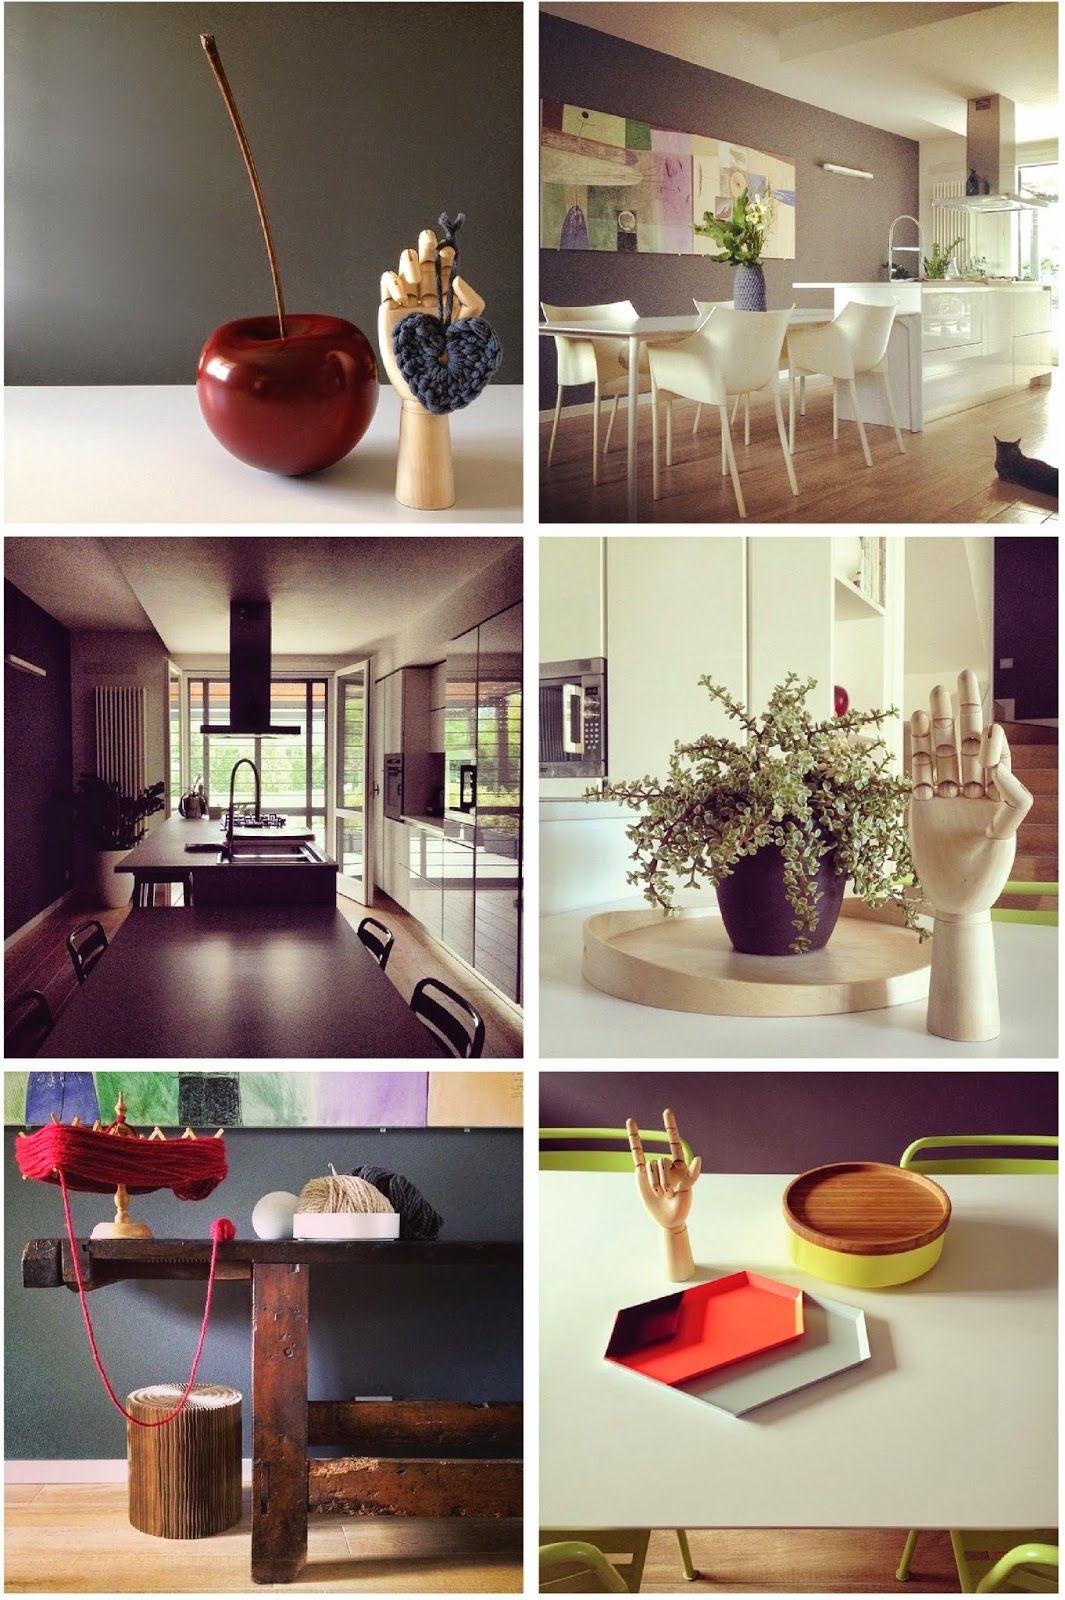 Follow @detailsofus on Instagram! :-)